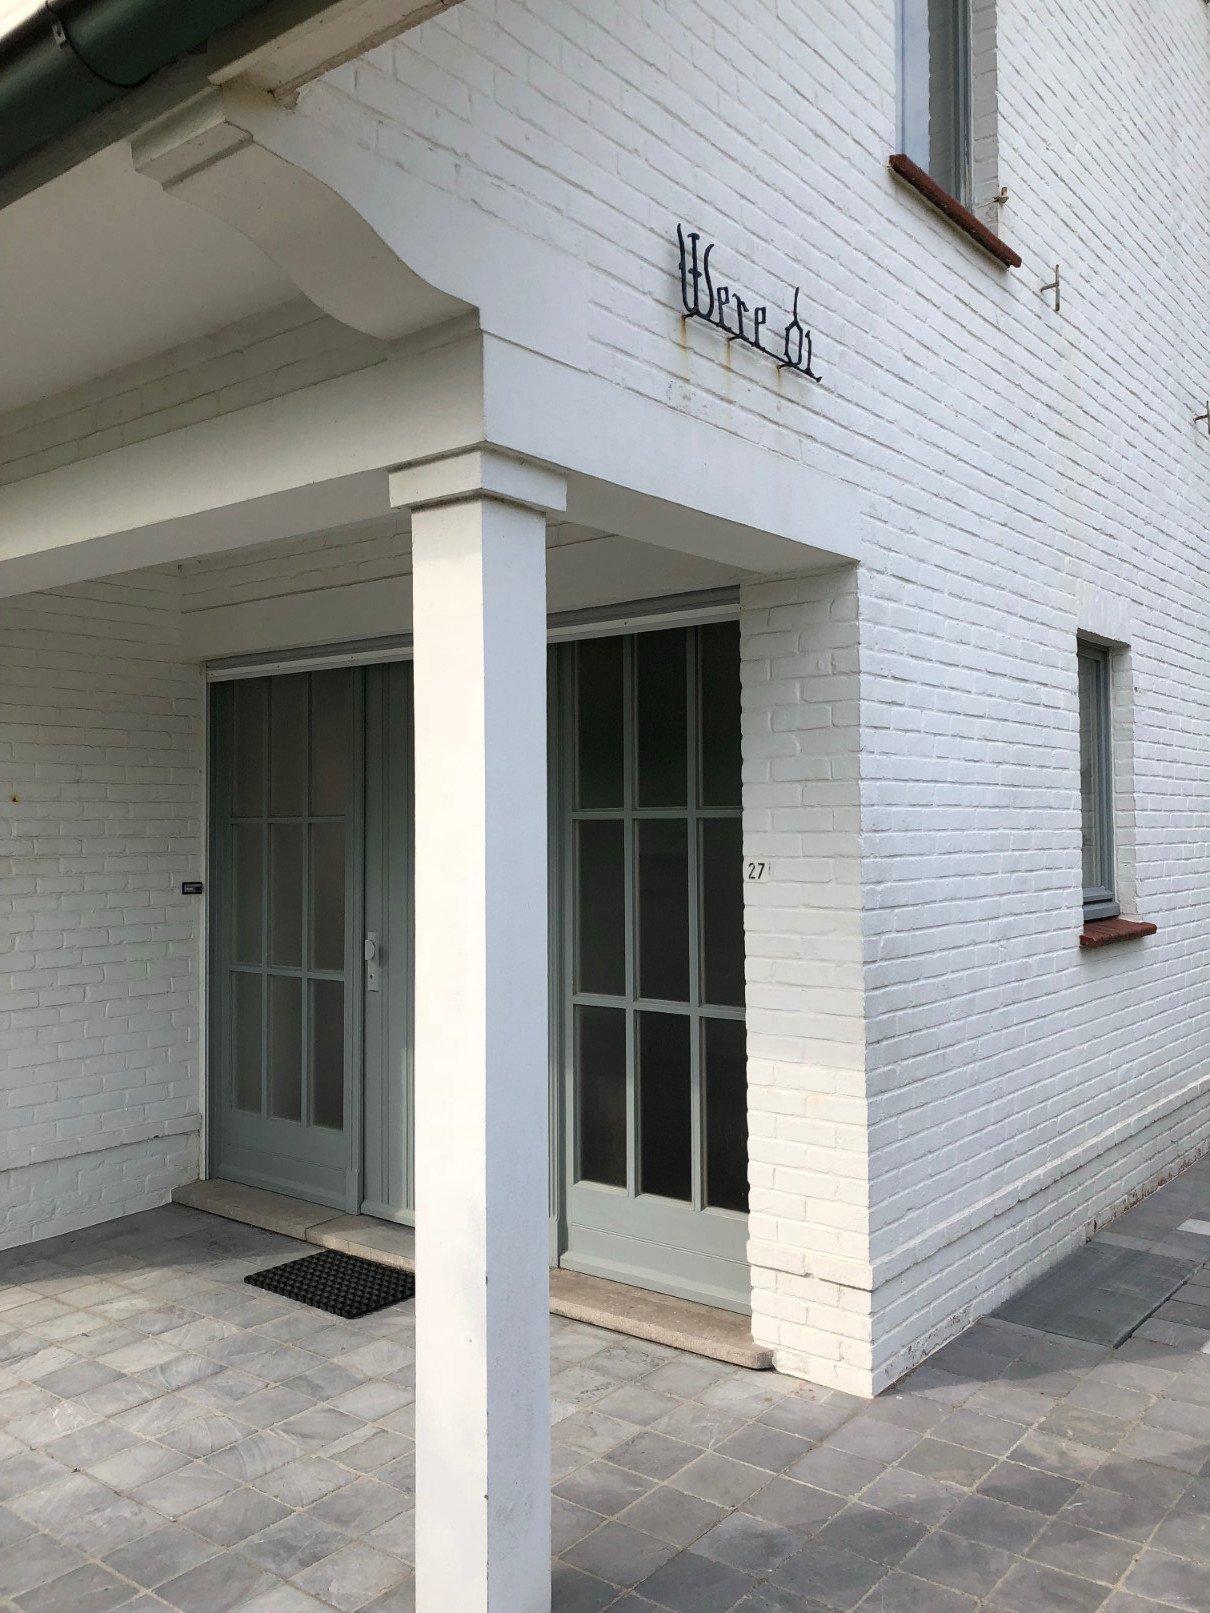 Rietveldprojects-Villa Were Di - Te Koop : Te Huur (per week)24